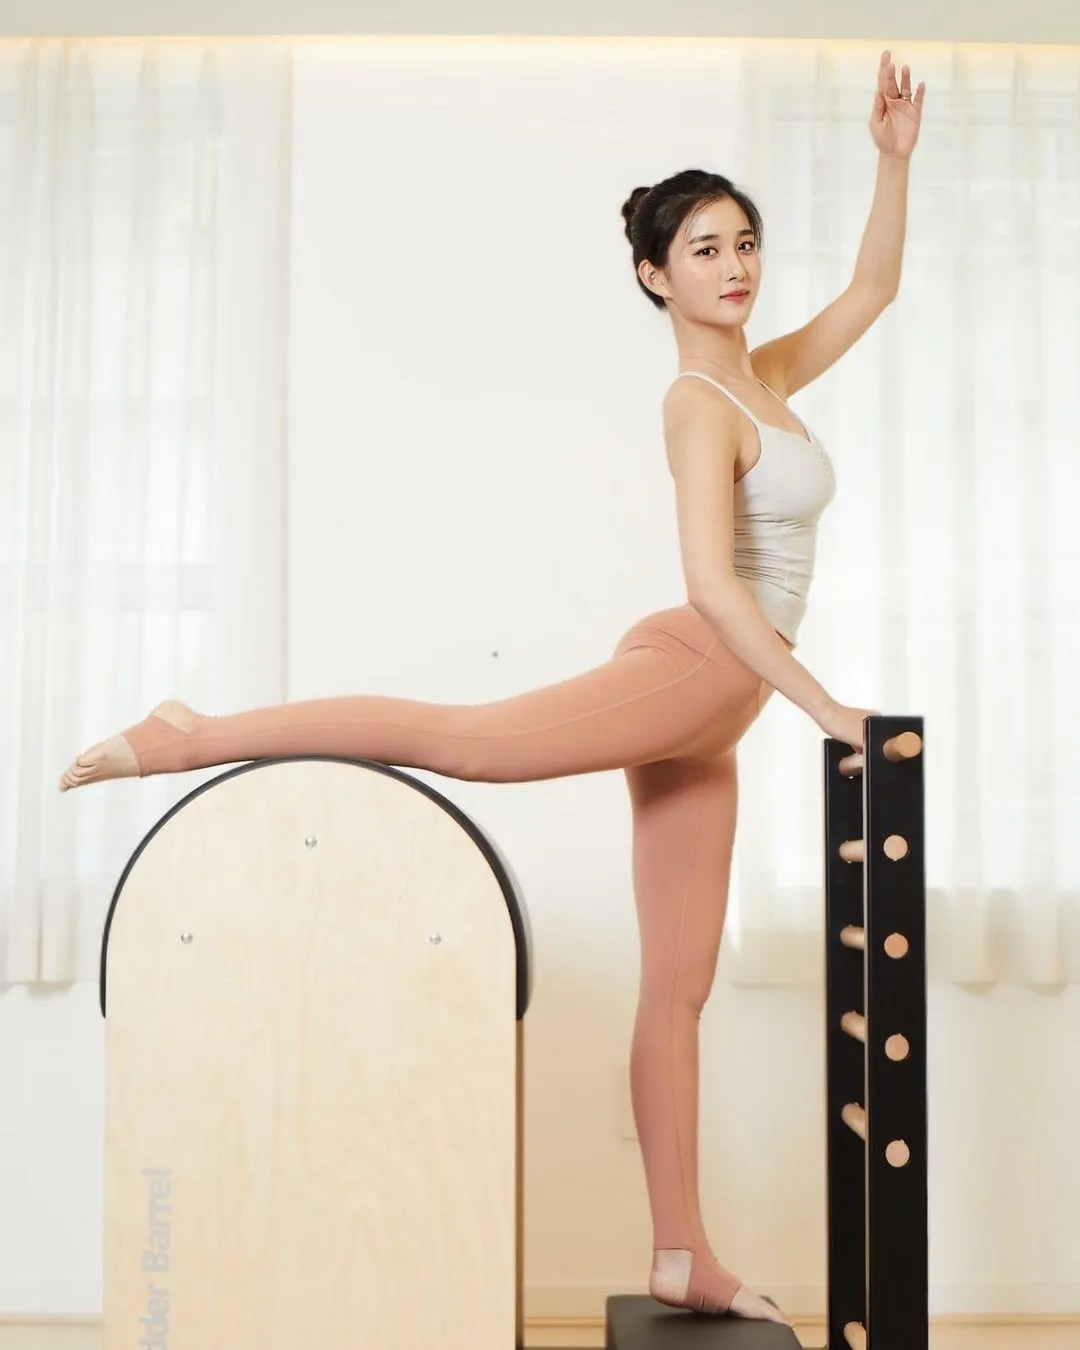 Shin Jisoo - Pilates Princess (former K-pop idol from Tahiti)